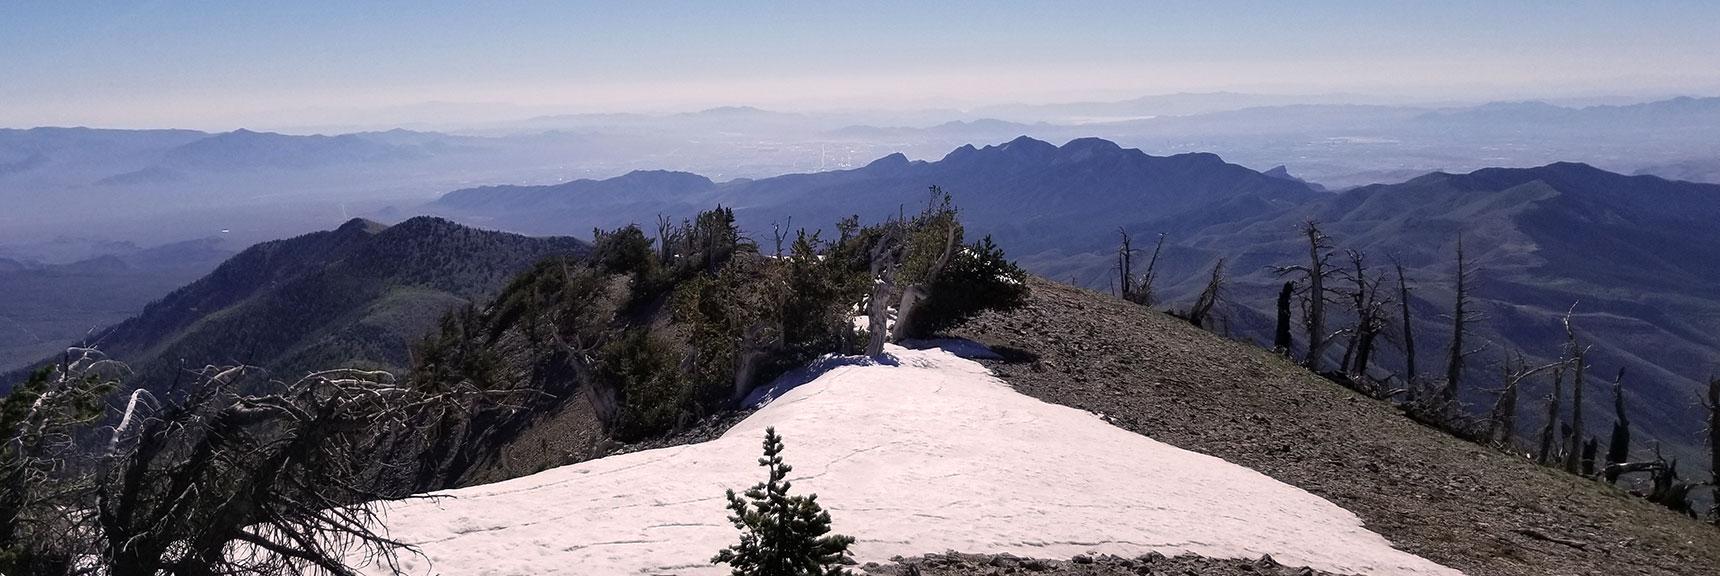 La Madre Mt. Viewed from Griffith Peak Summit in Mt. Charleston Wilderness